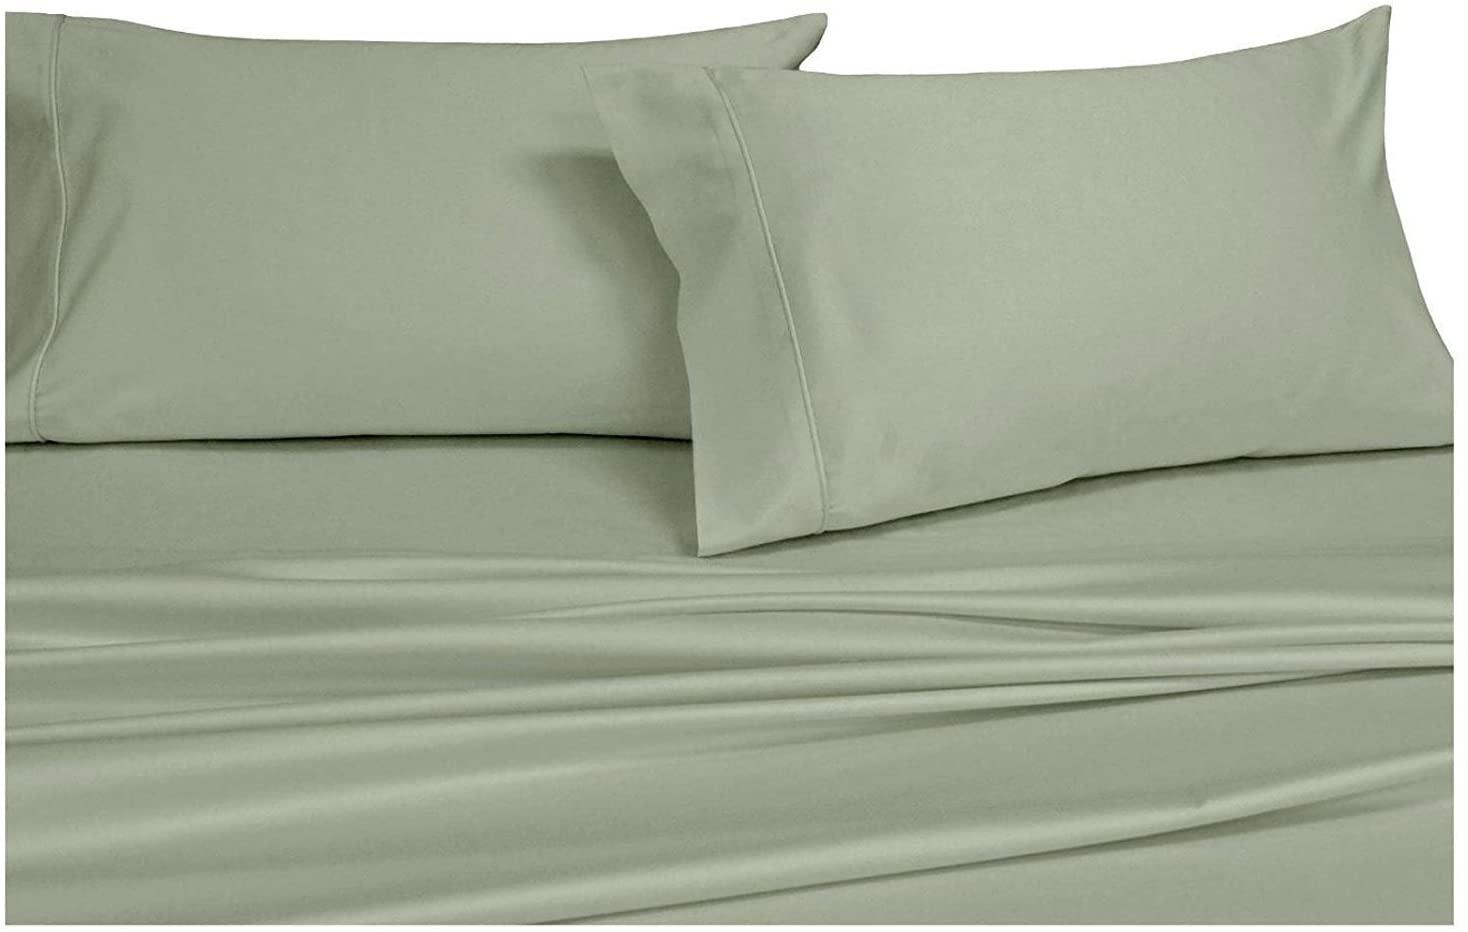 Royal Hotel Solid Sage Top-Split-Calking: Adjustable California King Bed Size Sheets, 4PC Bed Sheet Set, 100% Cotton, 300 Thread Count, Sateen Solid, Deep Pocket